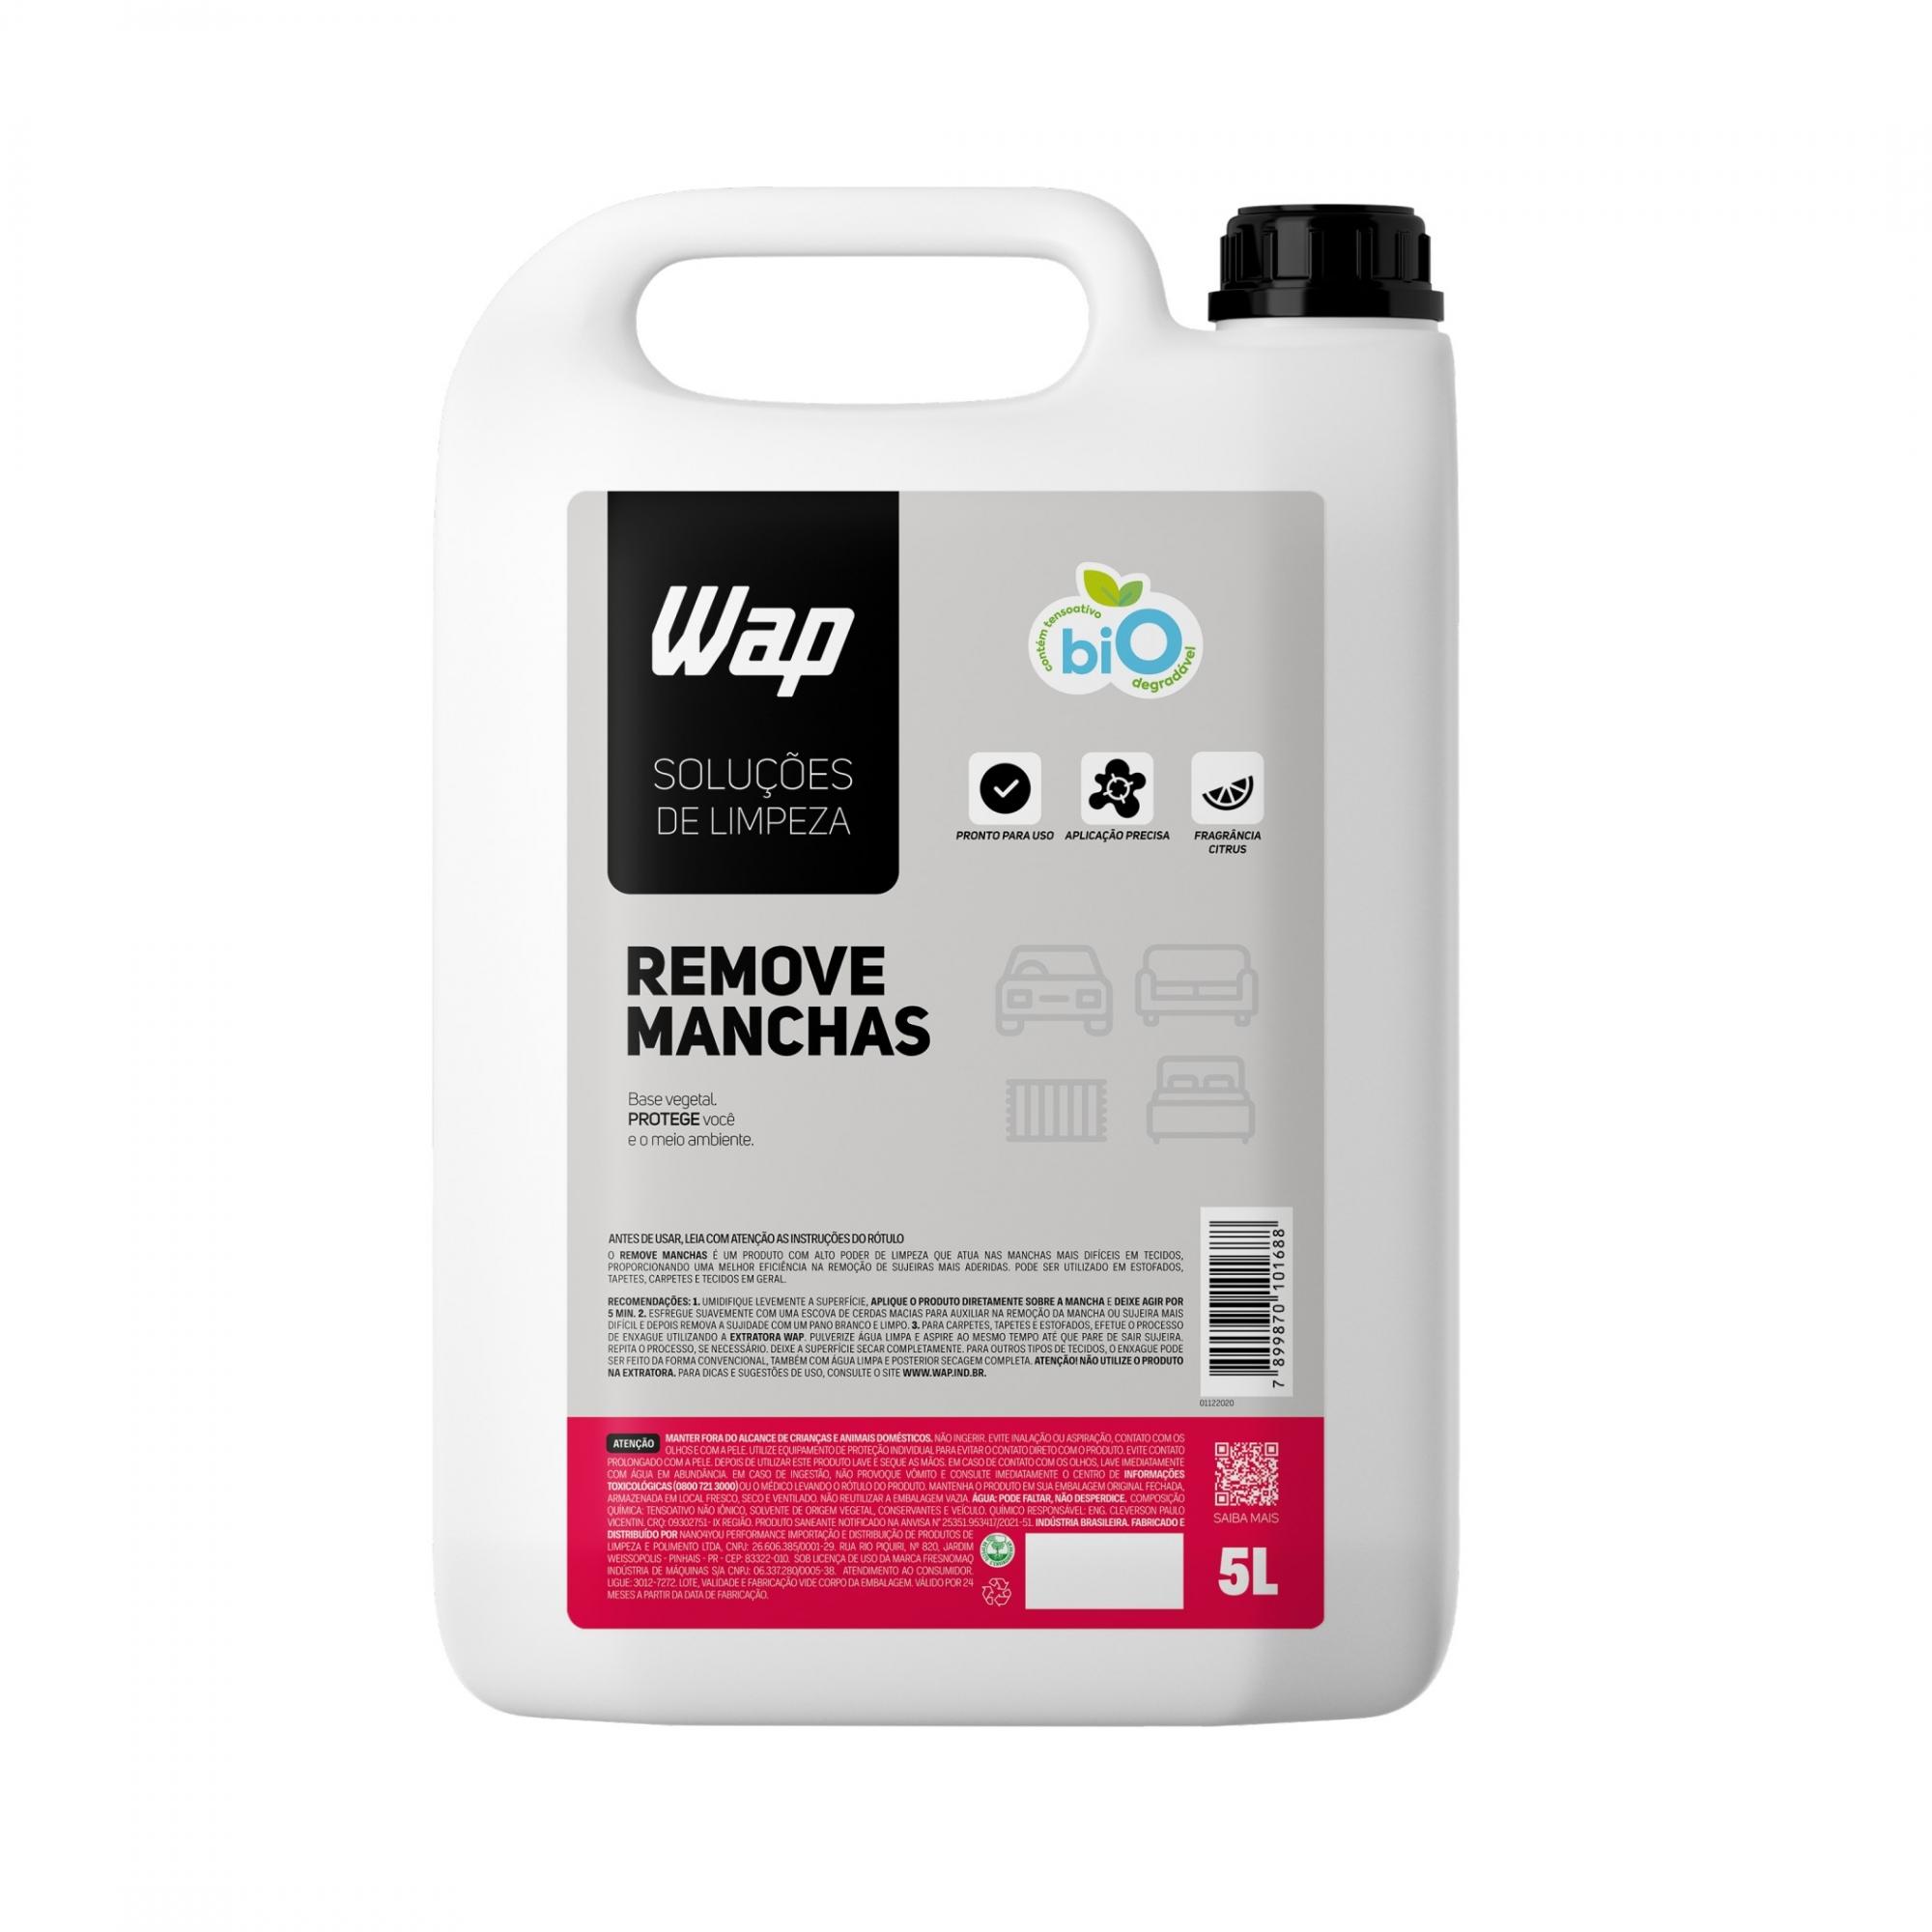 Remove Manchas 5L - Solução de Limpeza Wap